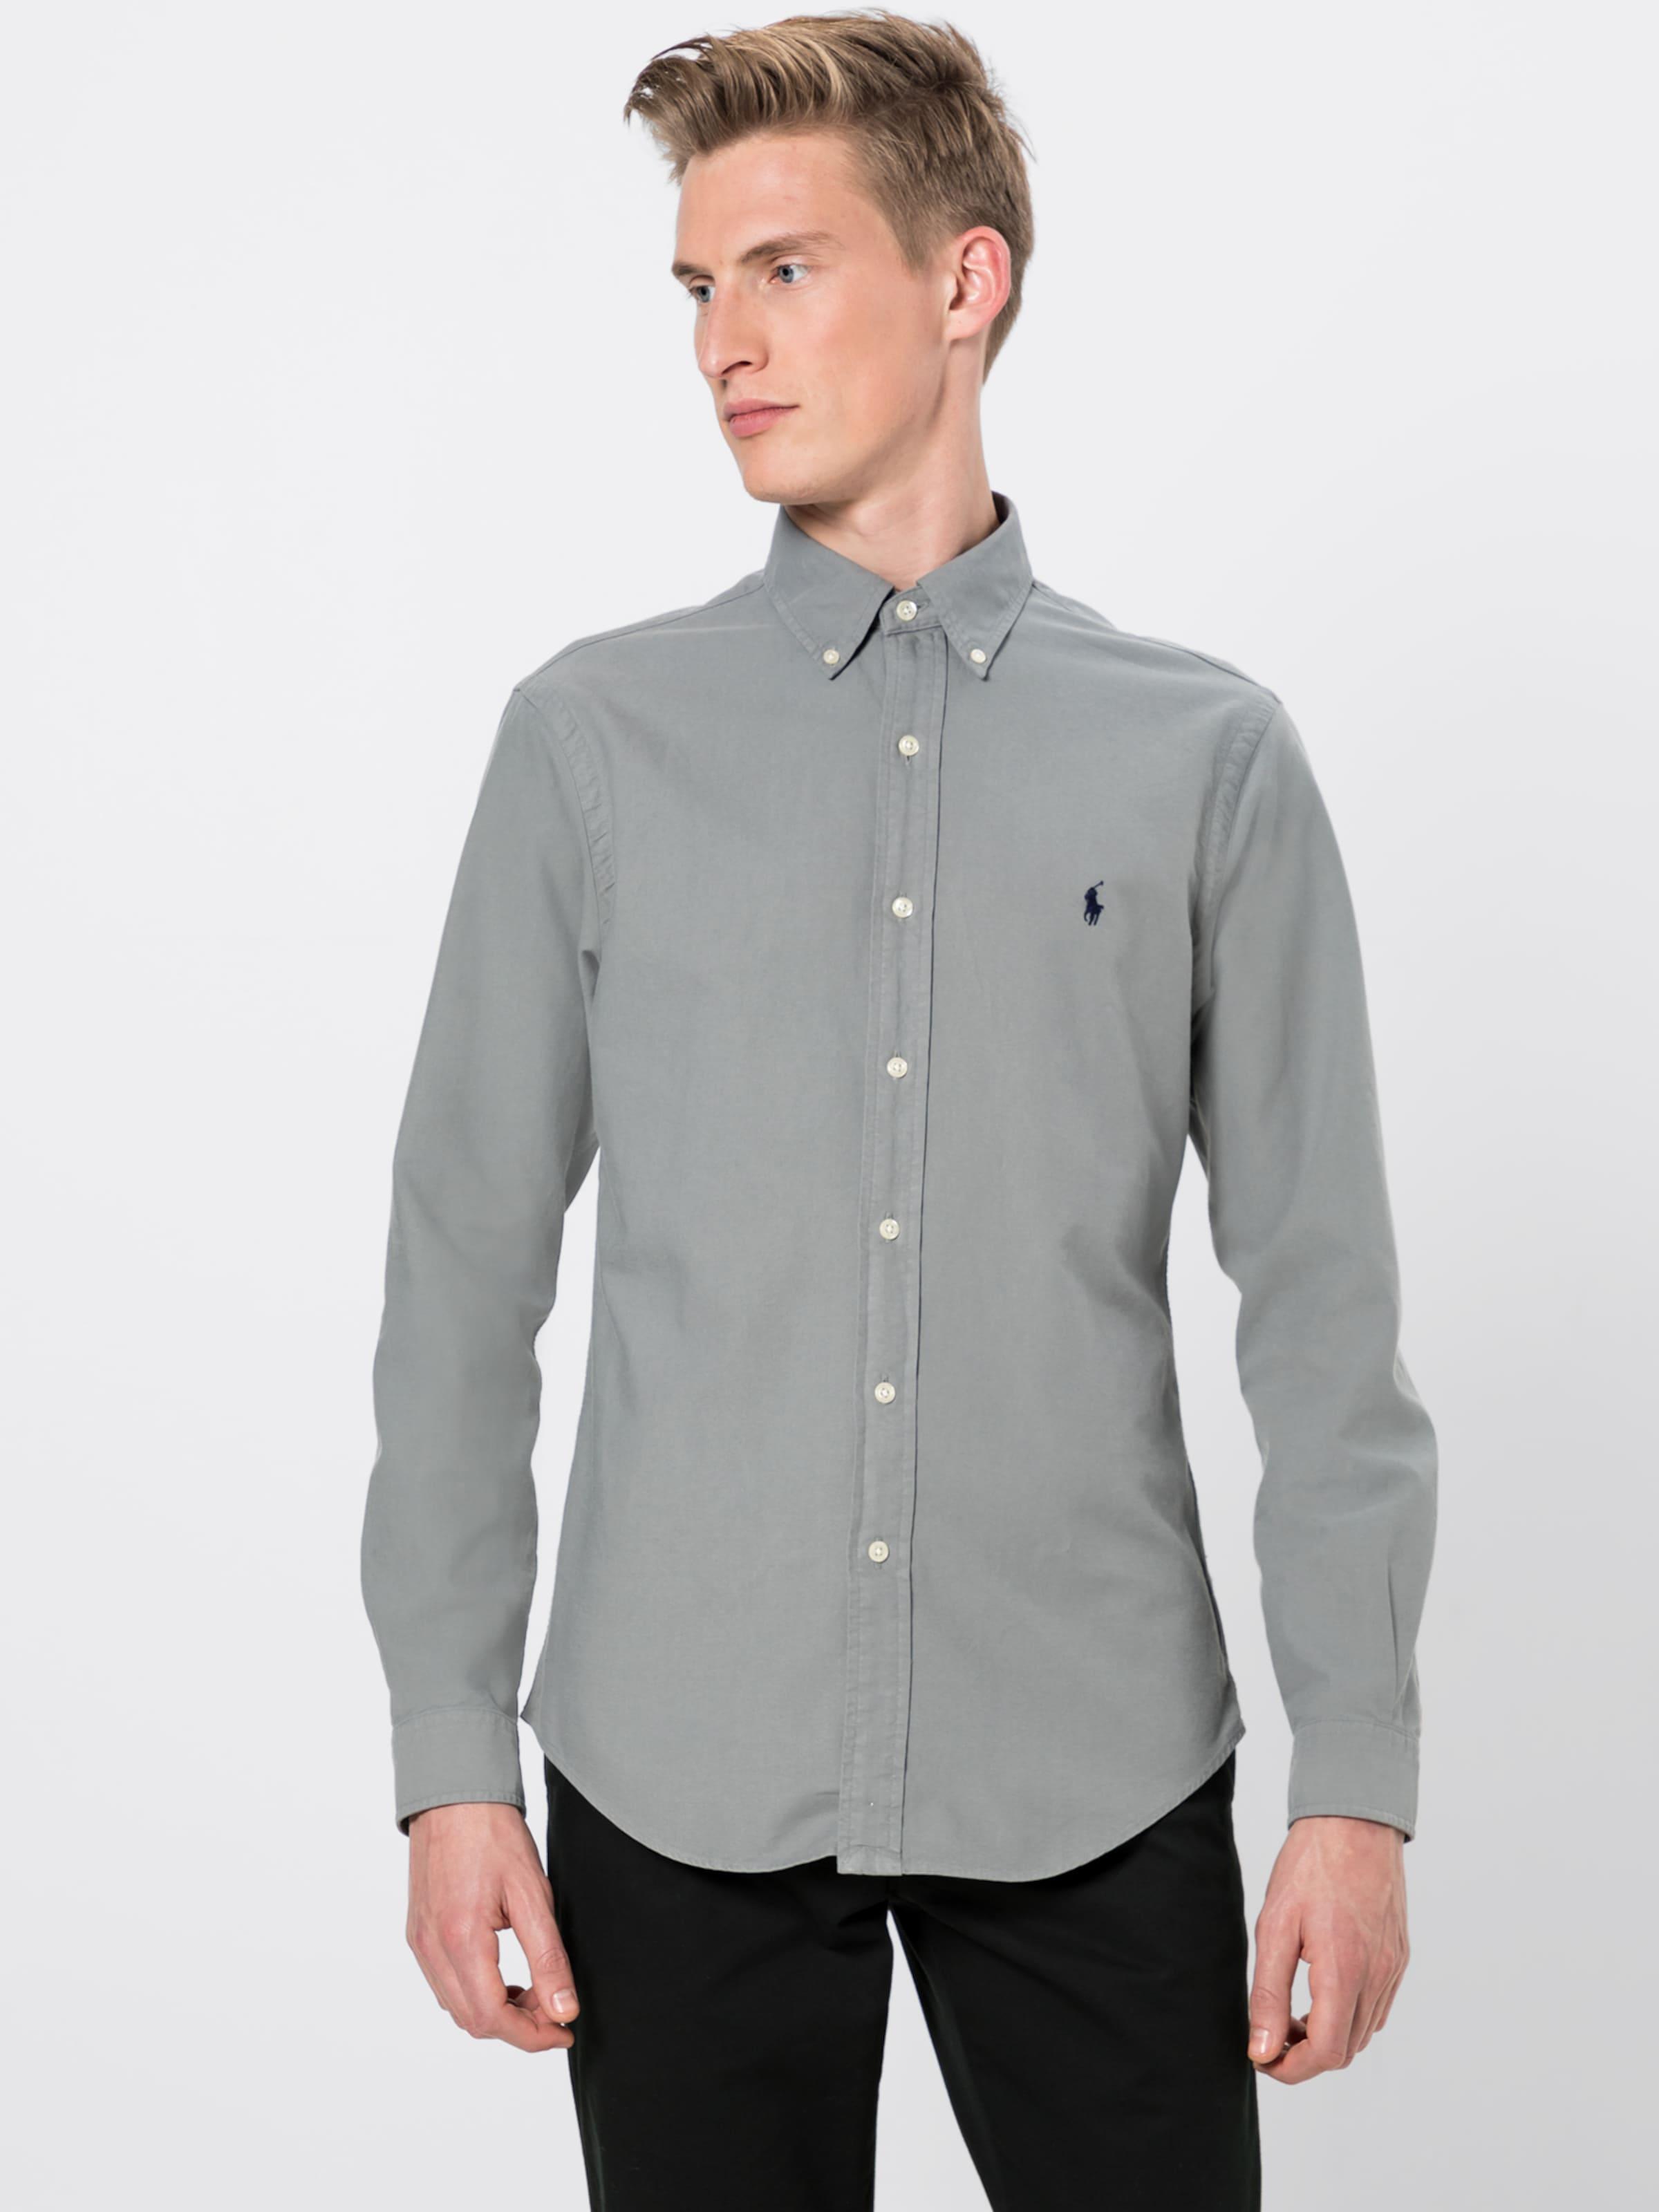 Polo Sleeve Shirt' In Dunkelgrau long Ralph sport Lauren Bd 'sl Sp Ppc dWCBxreo